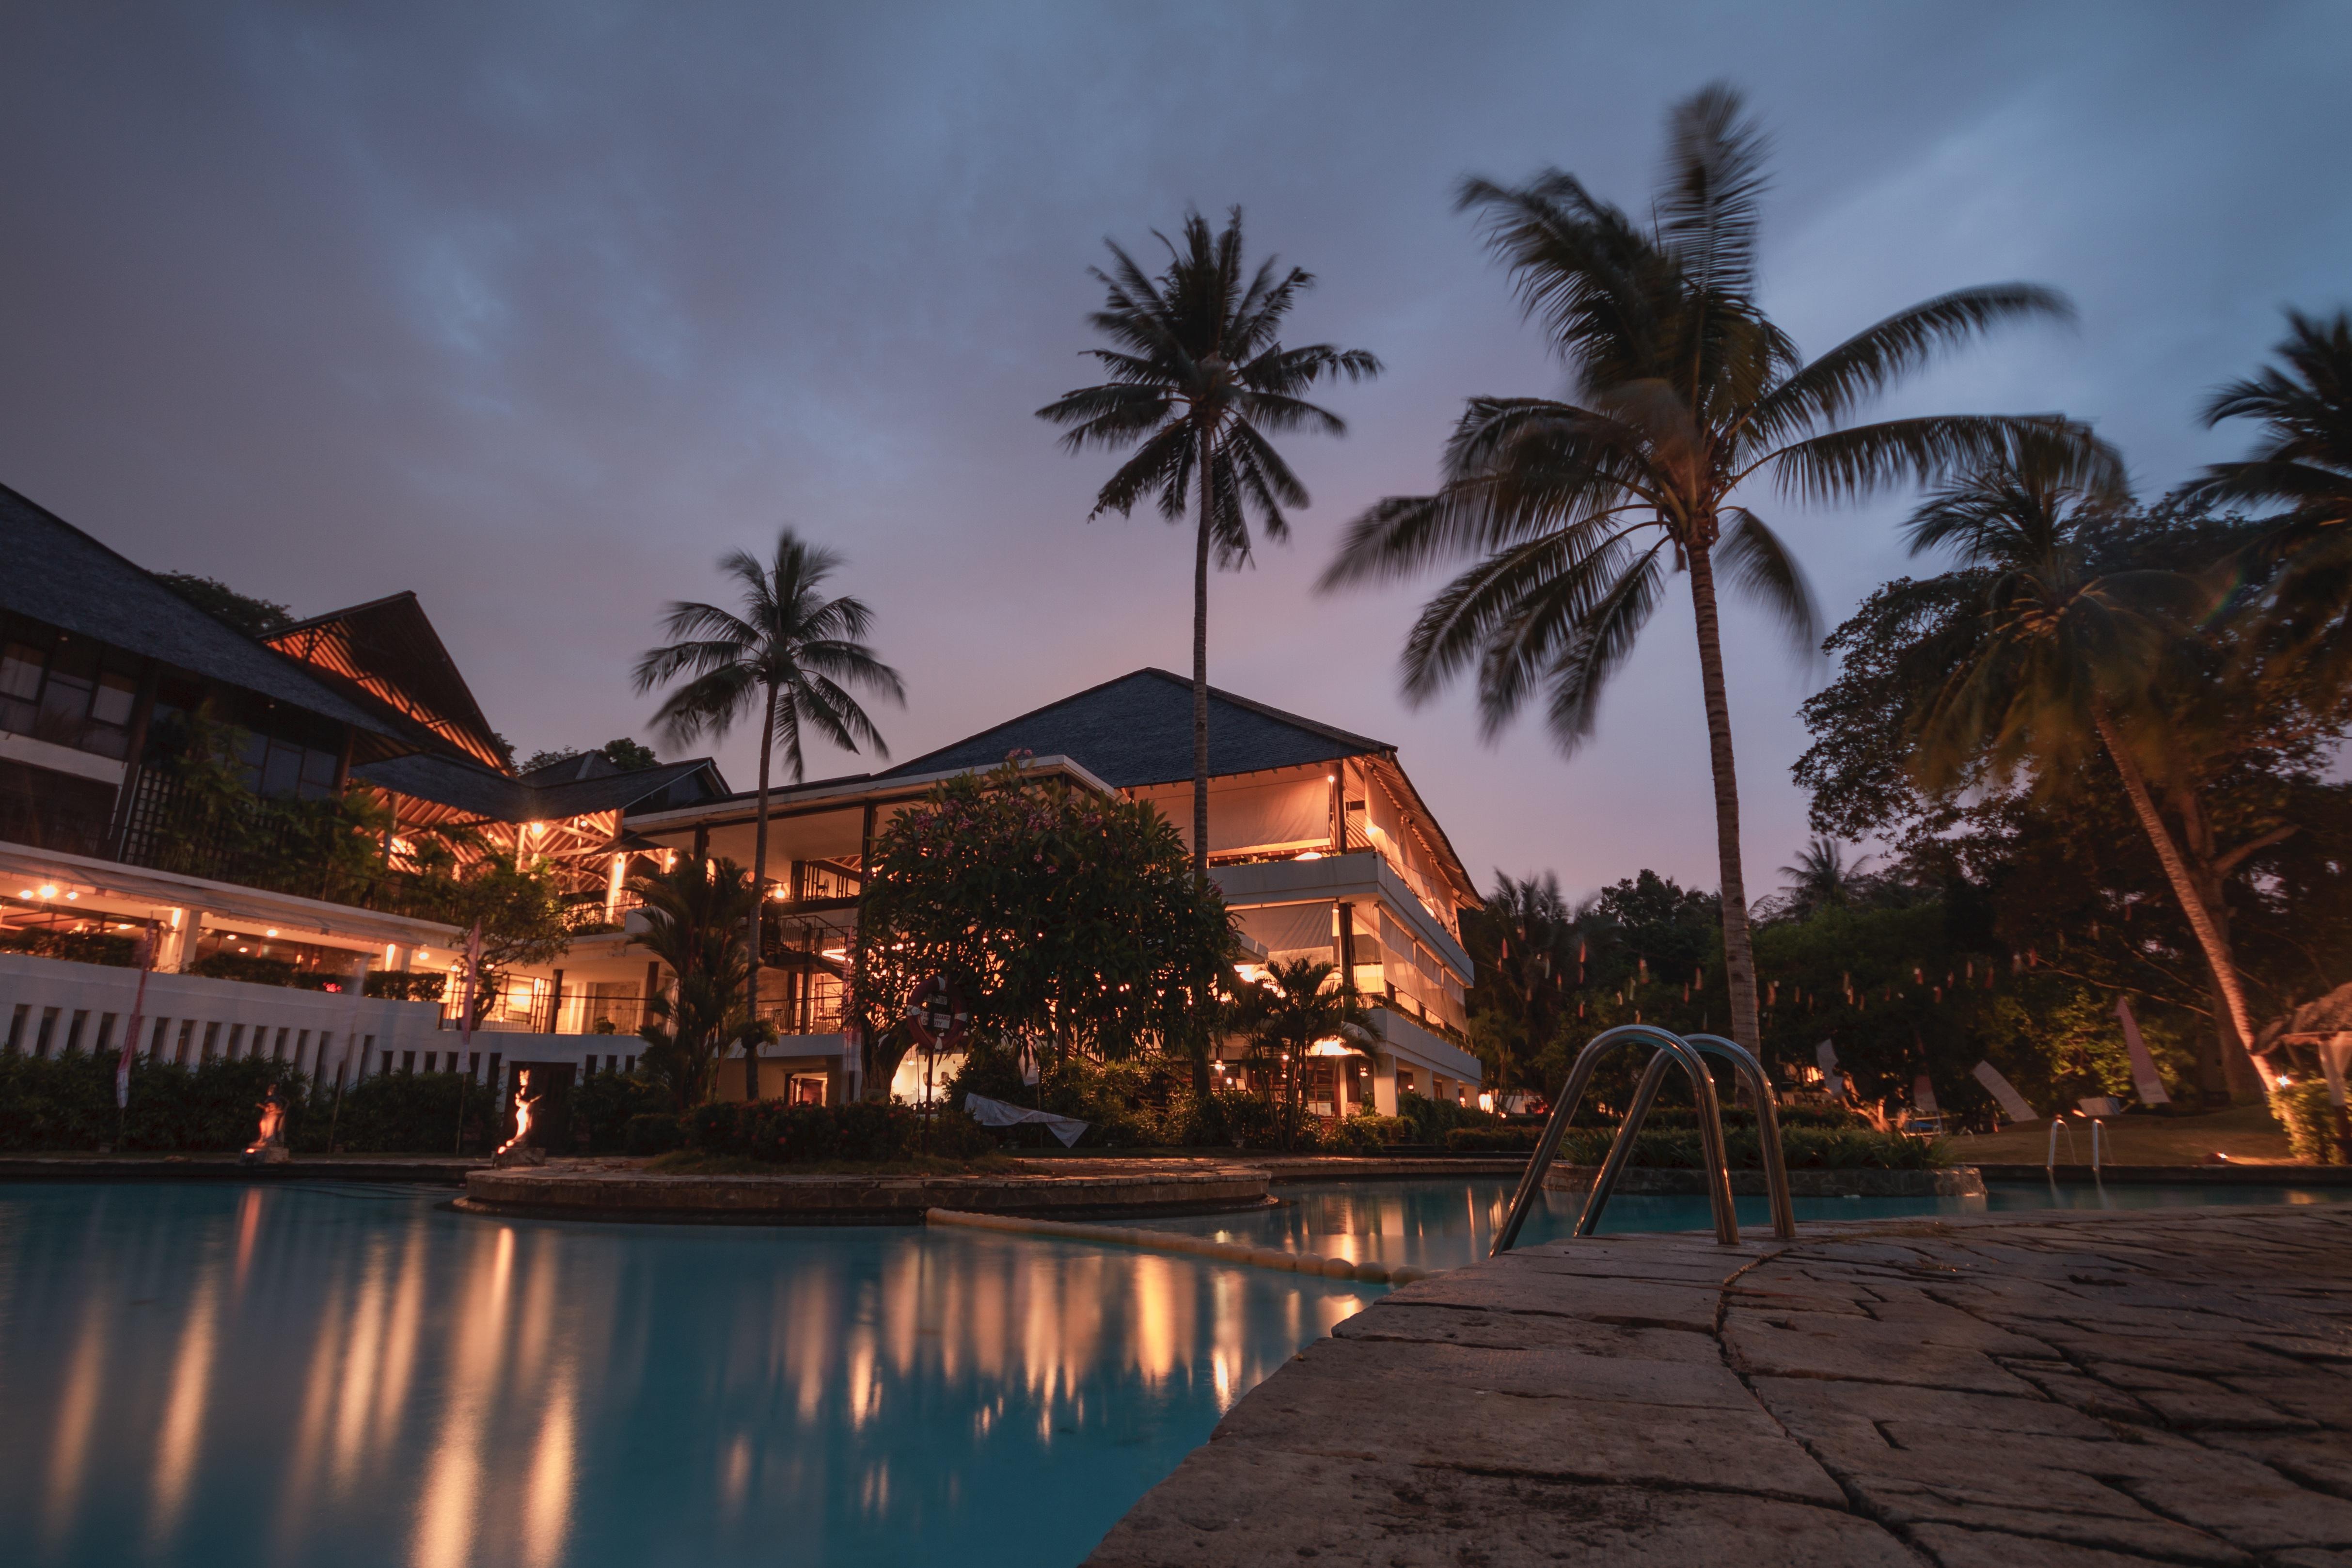 resort2.jpeg